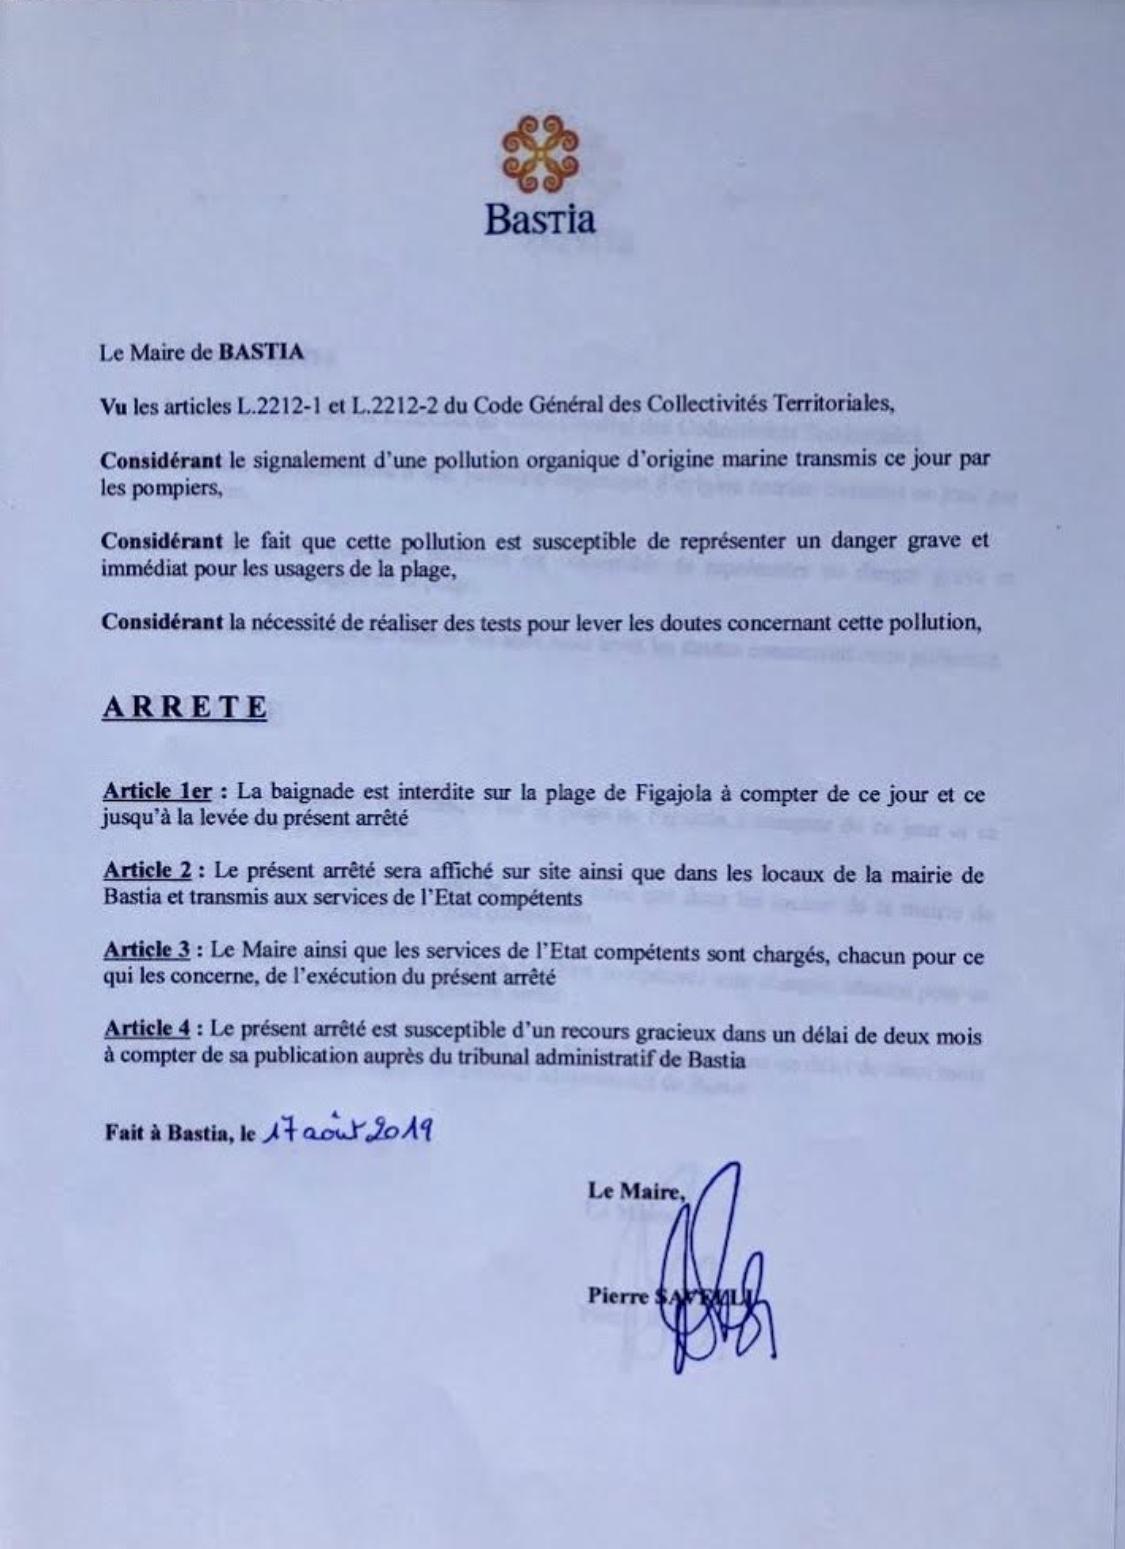 Bastia : Baignade interdite et plage fermée à Ficaghjola